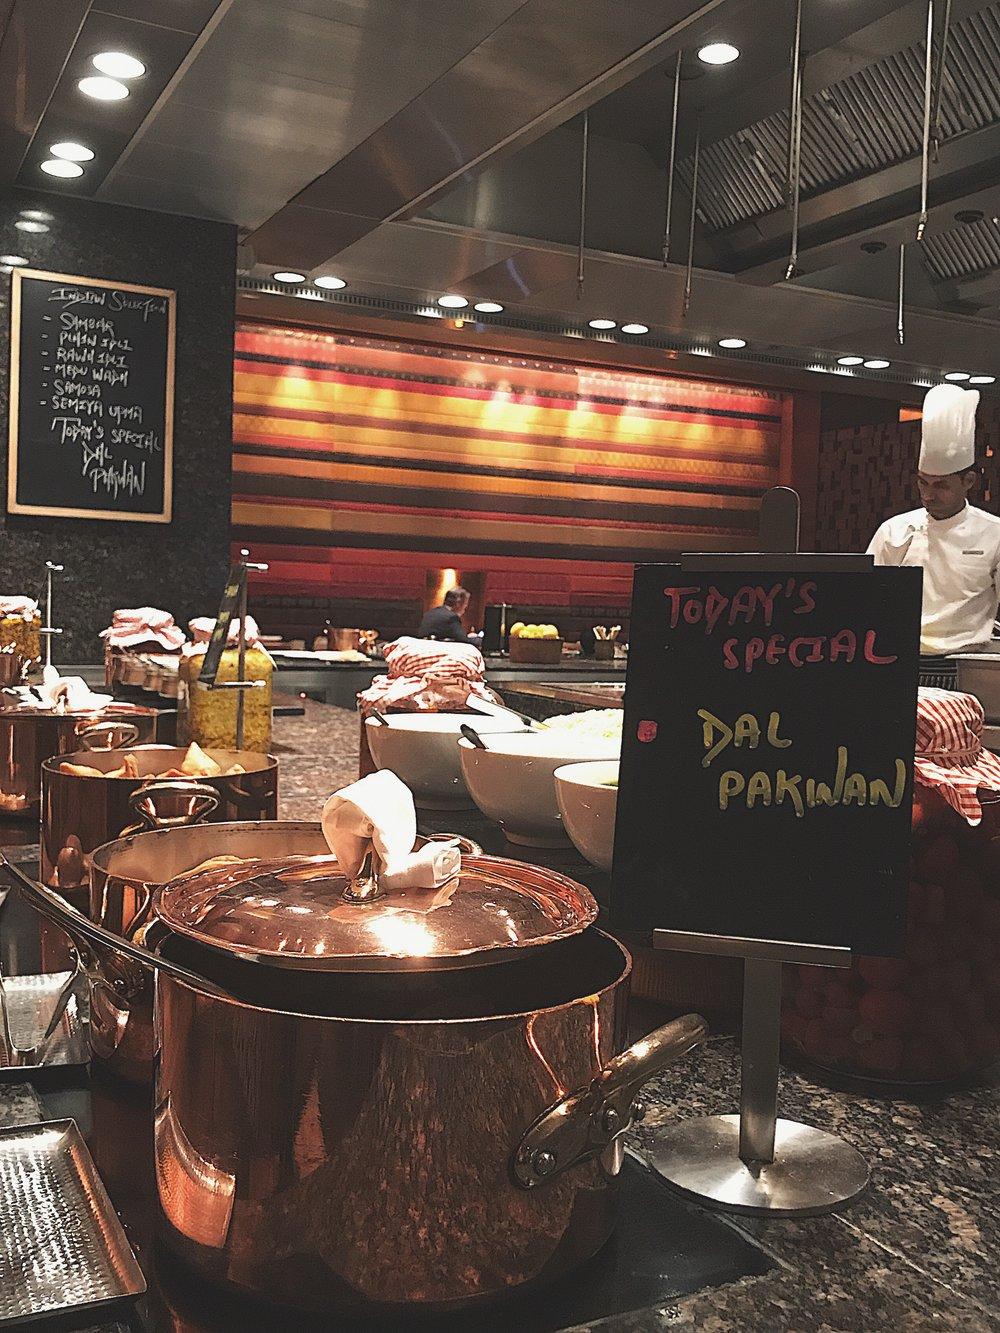 Indian food station